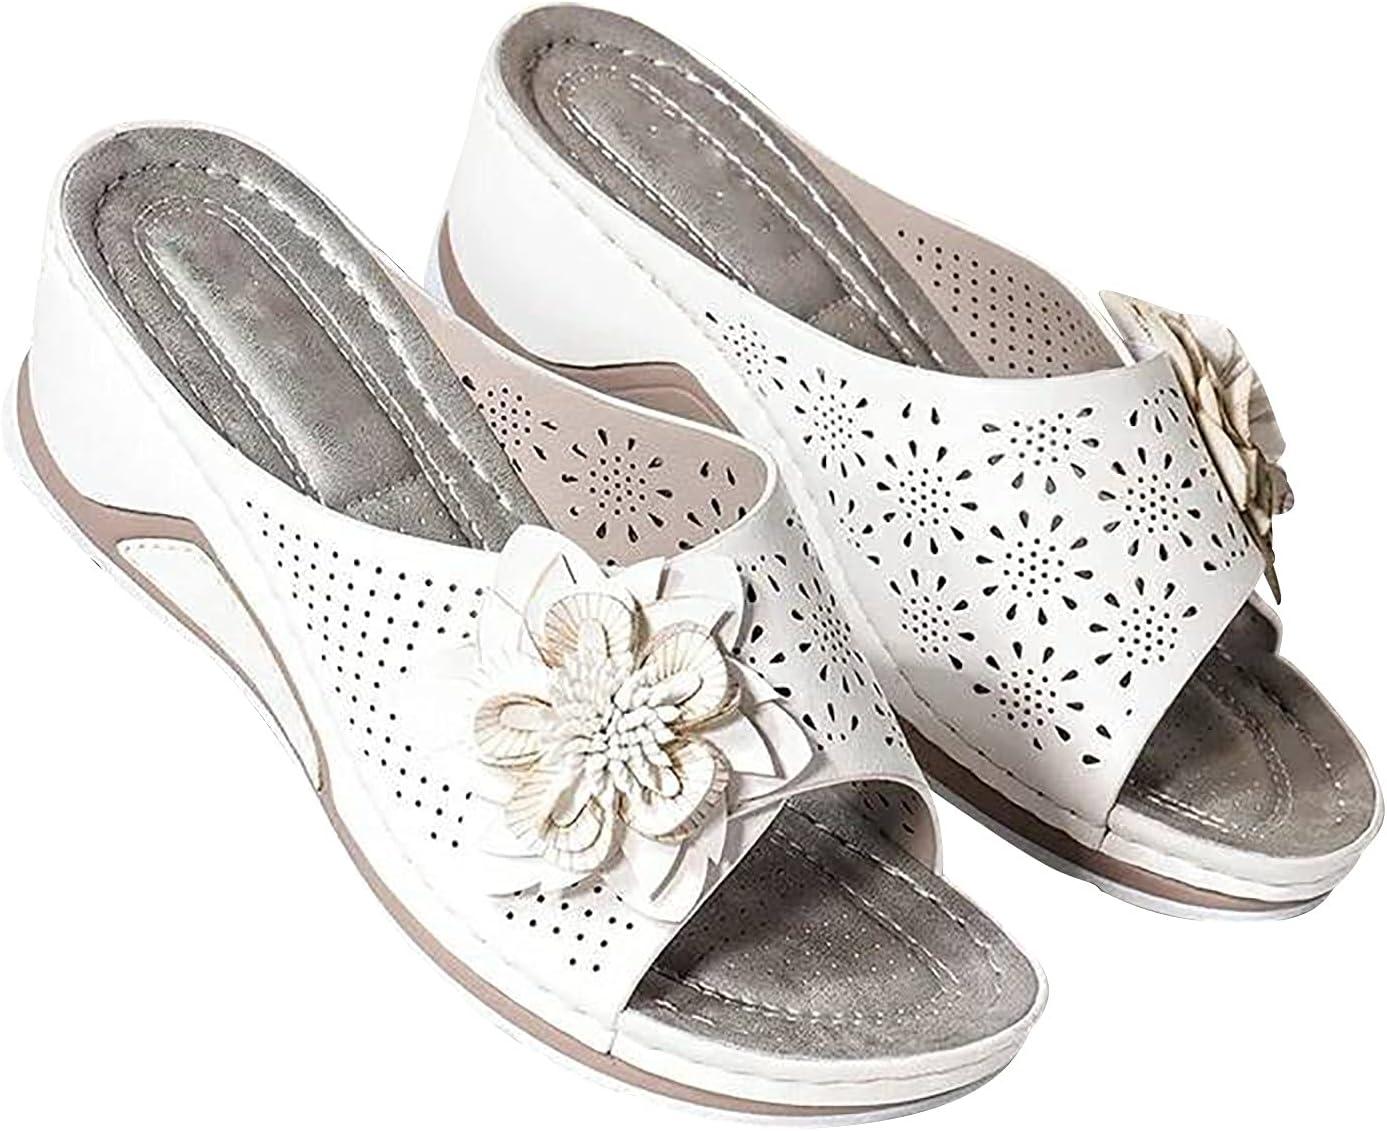 Women Orthopedic Wedge Sandals,Comfy Peep Toe Slides Sandals Vintage Fish Mouth Soft Orthopedic Arch-Support Sandals,Flip Flops Sport Orthotic Arch Support Sandals